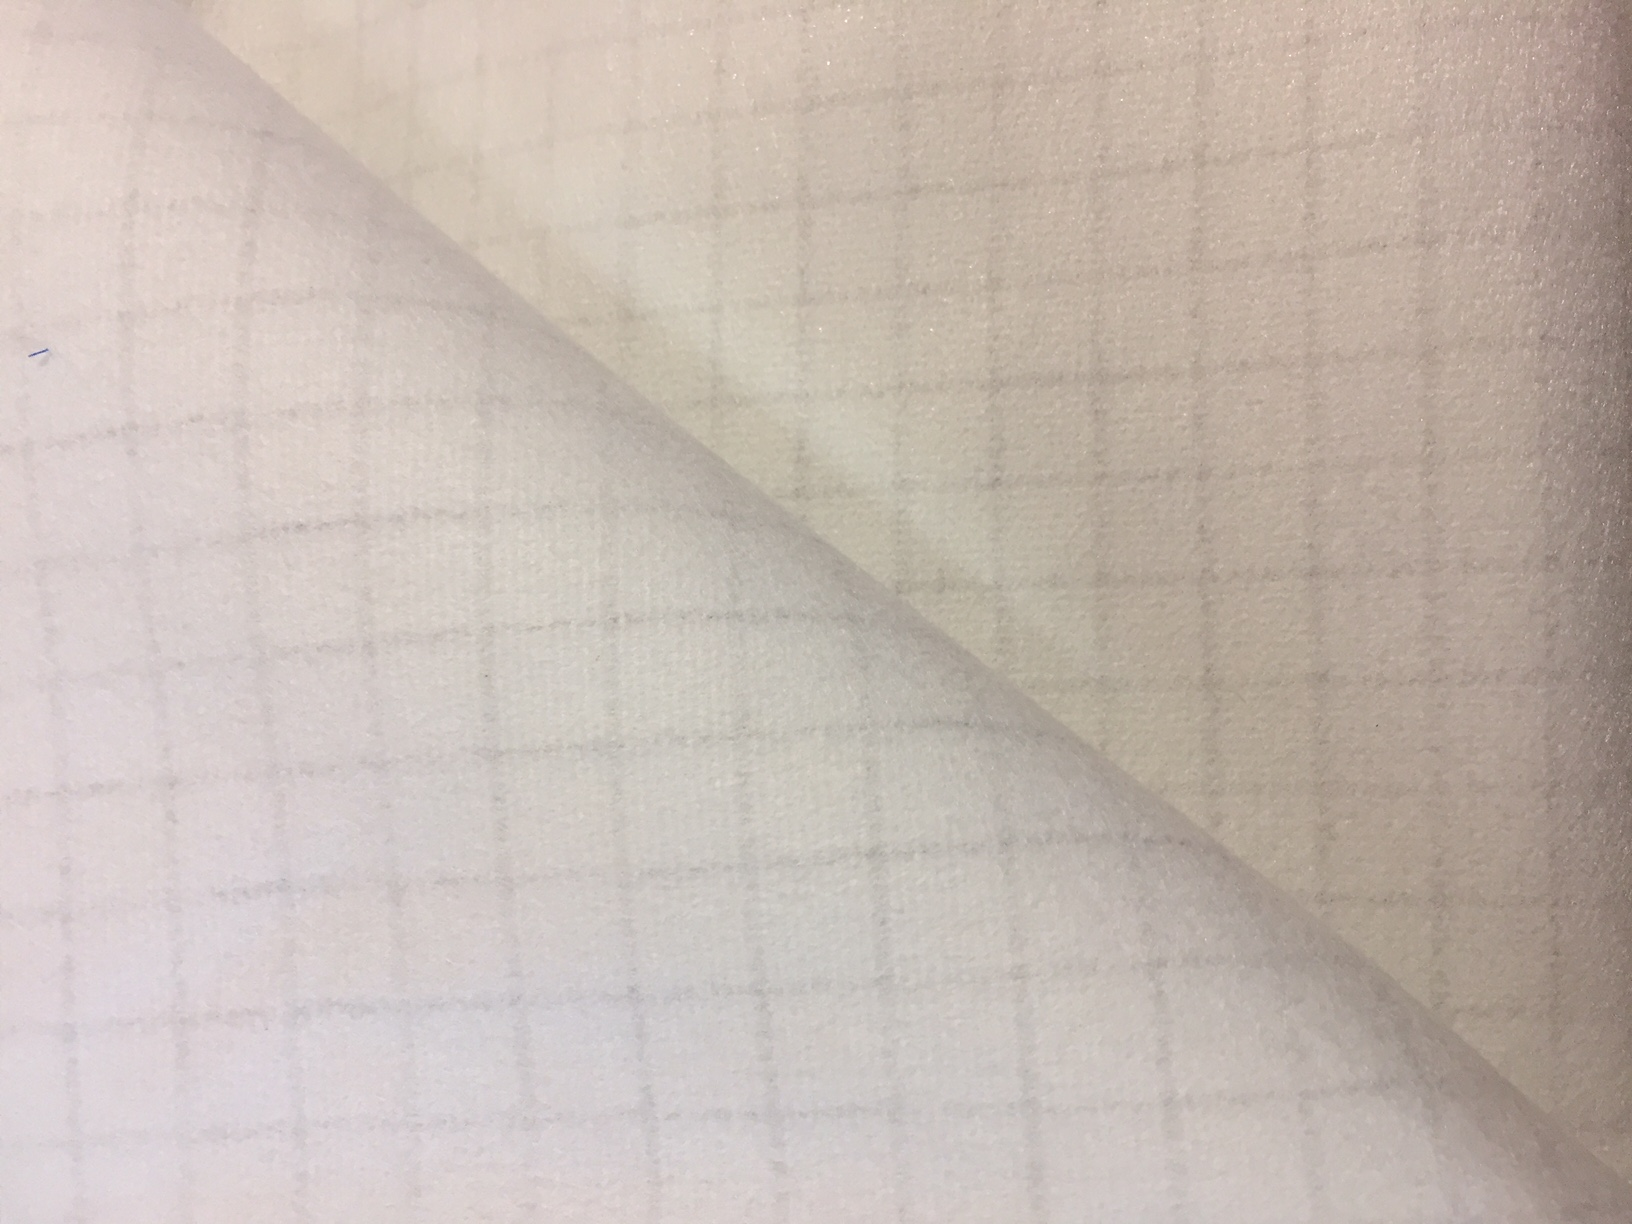 Filtrmateriāls, 1,5 mm, antistatisks